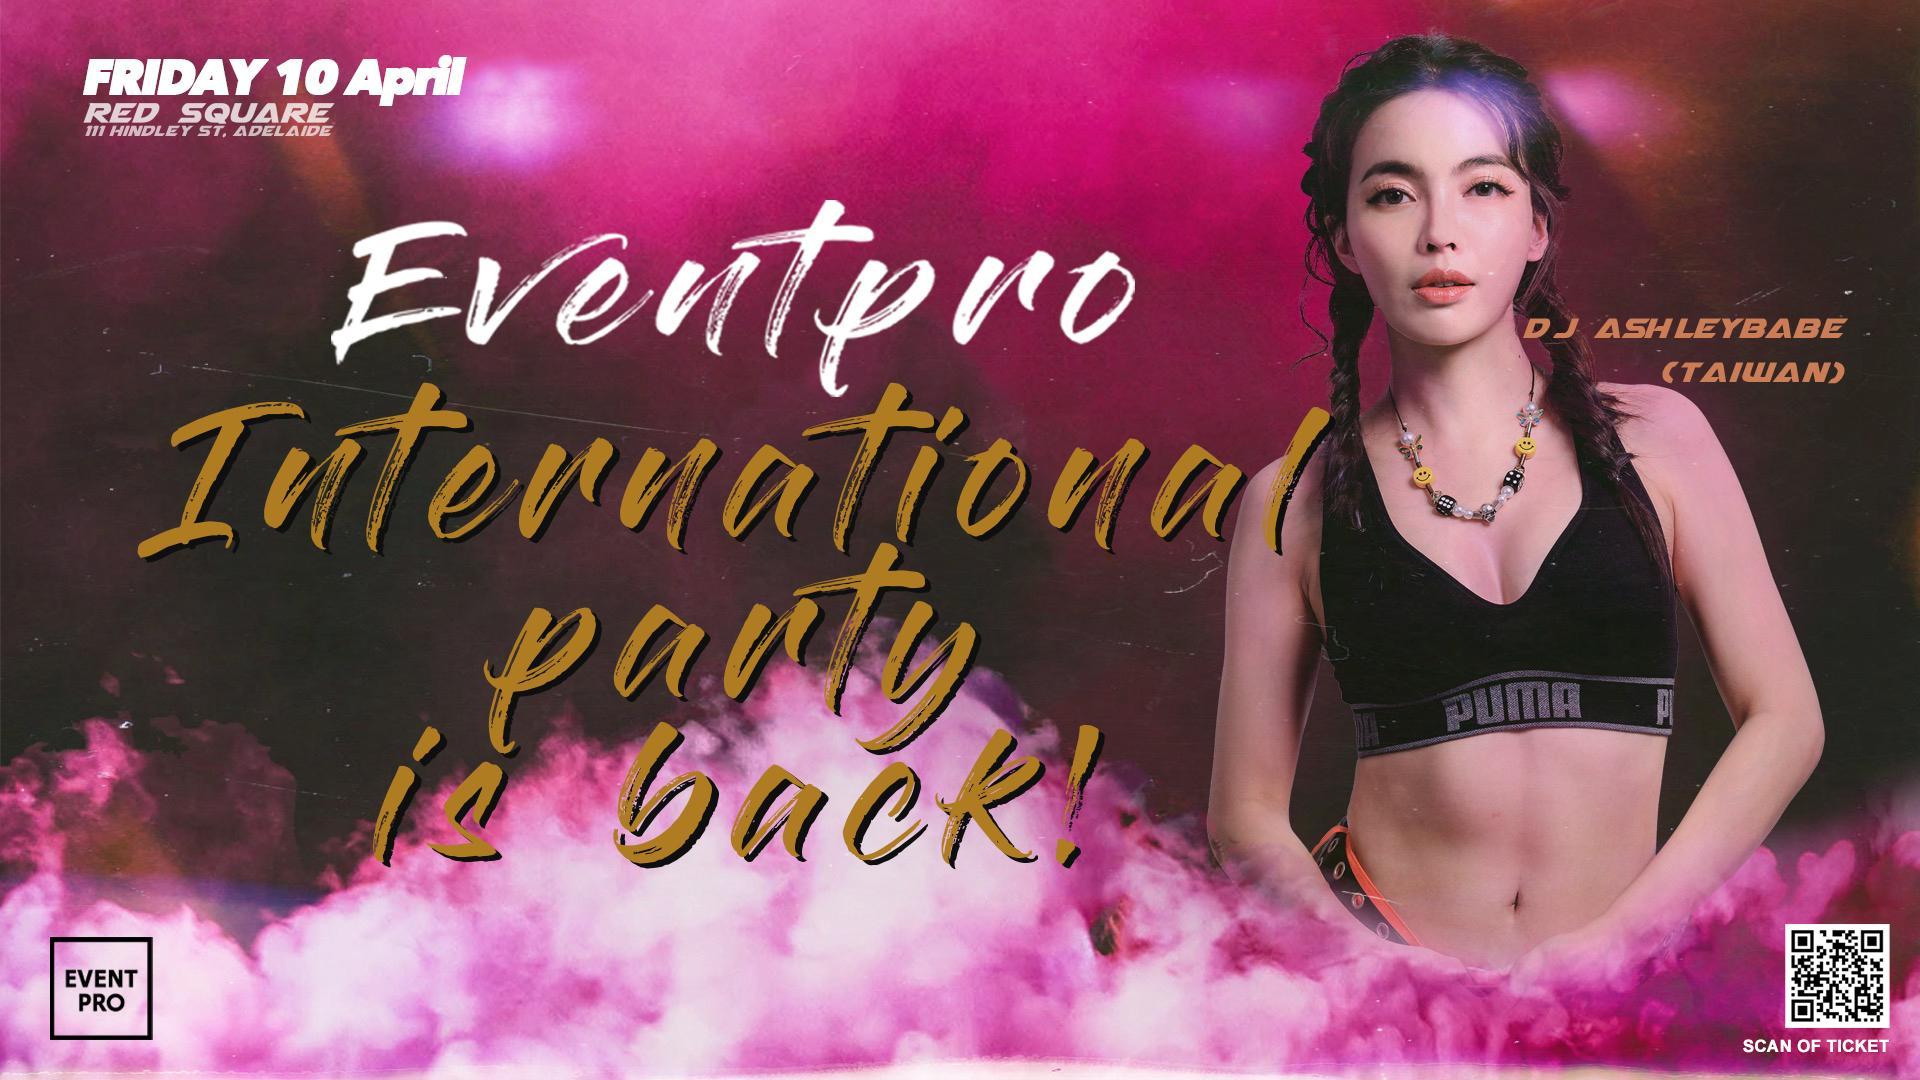 EVENTPRO International Party